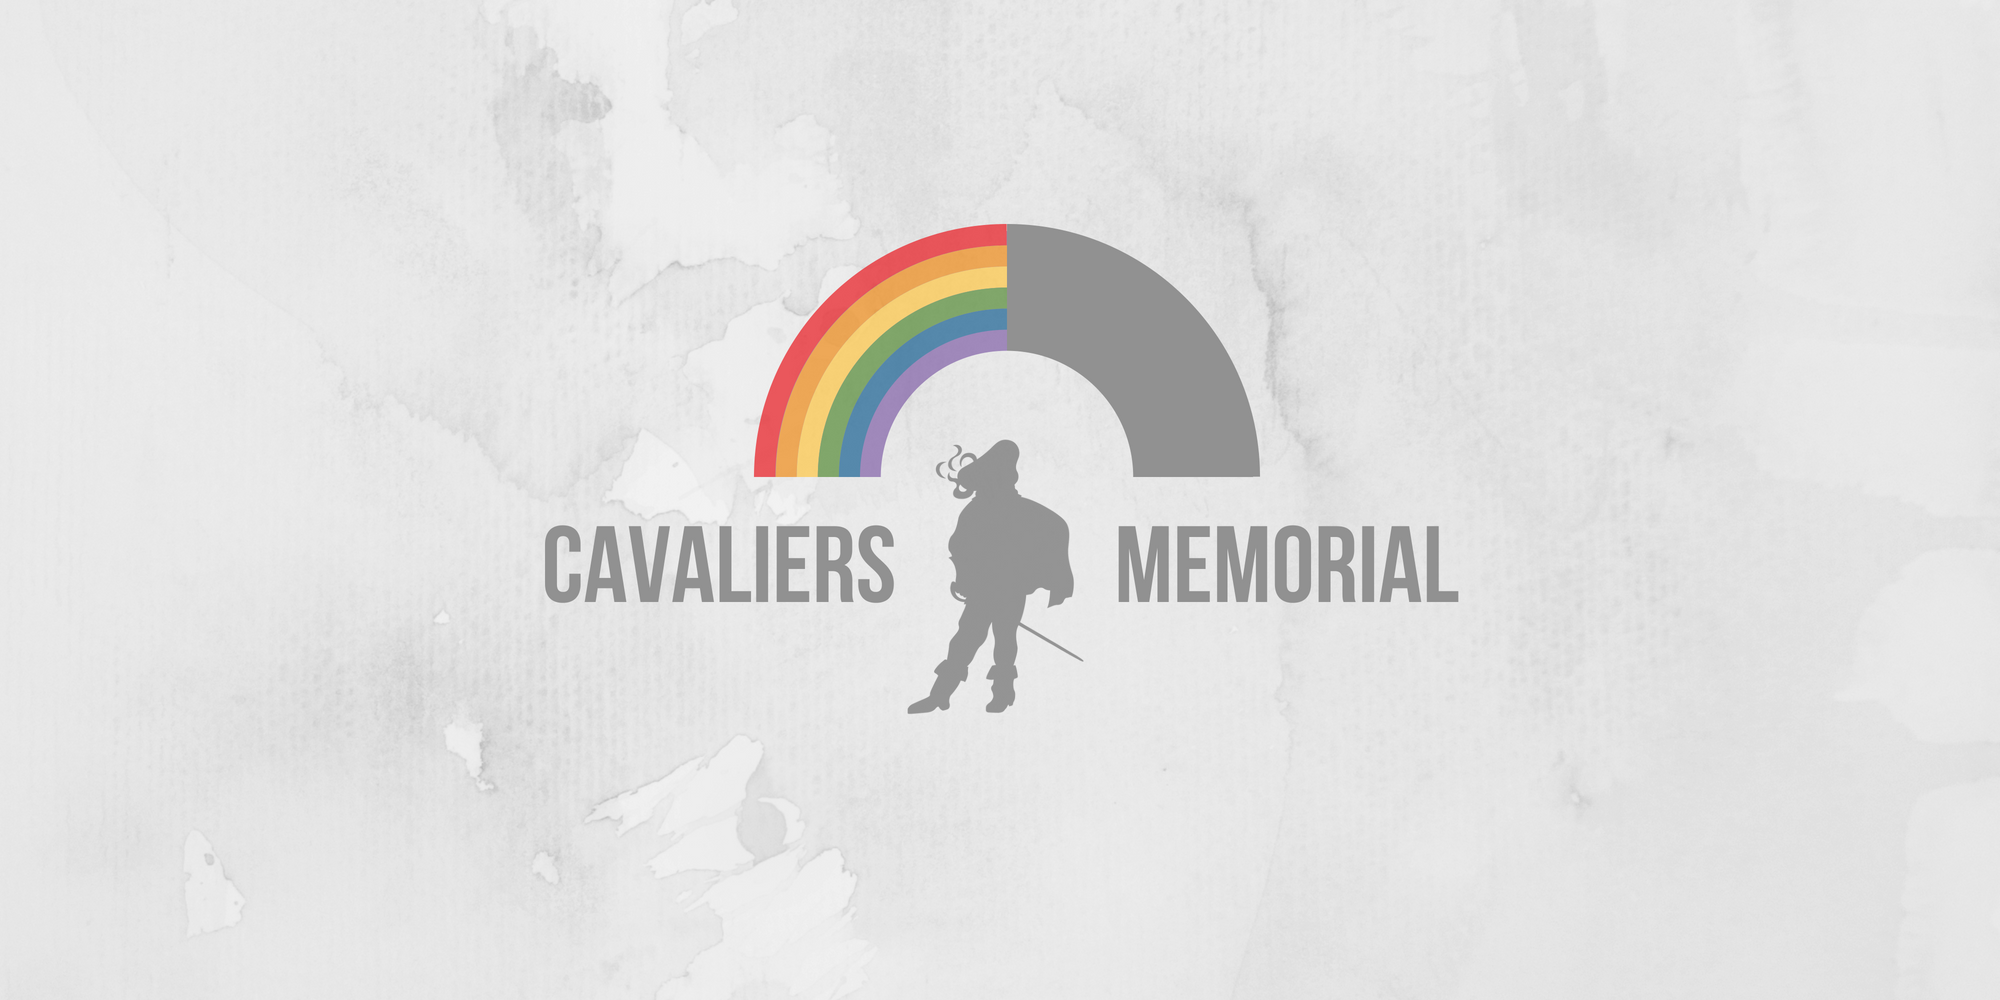 Cavaliers Memorial